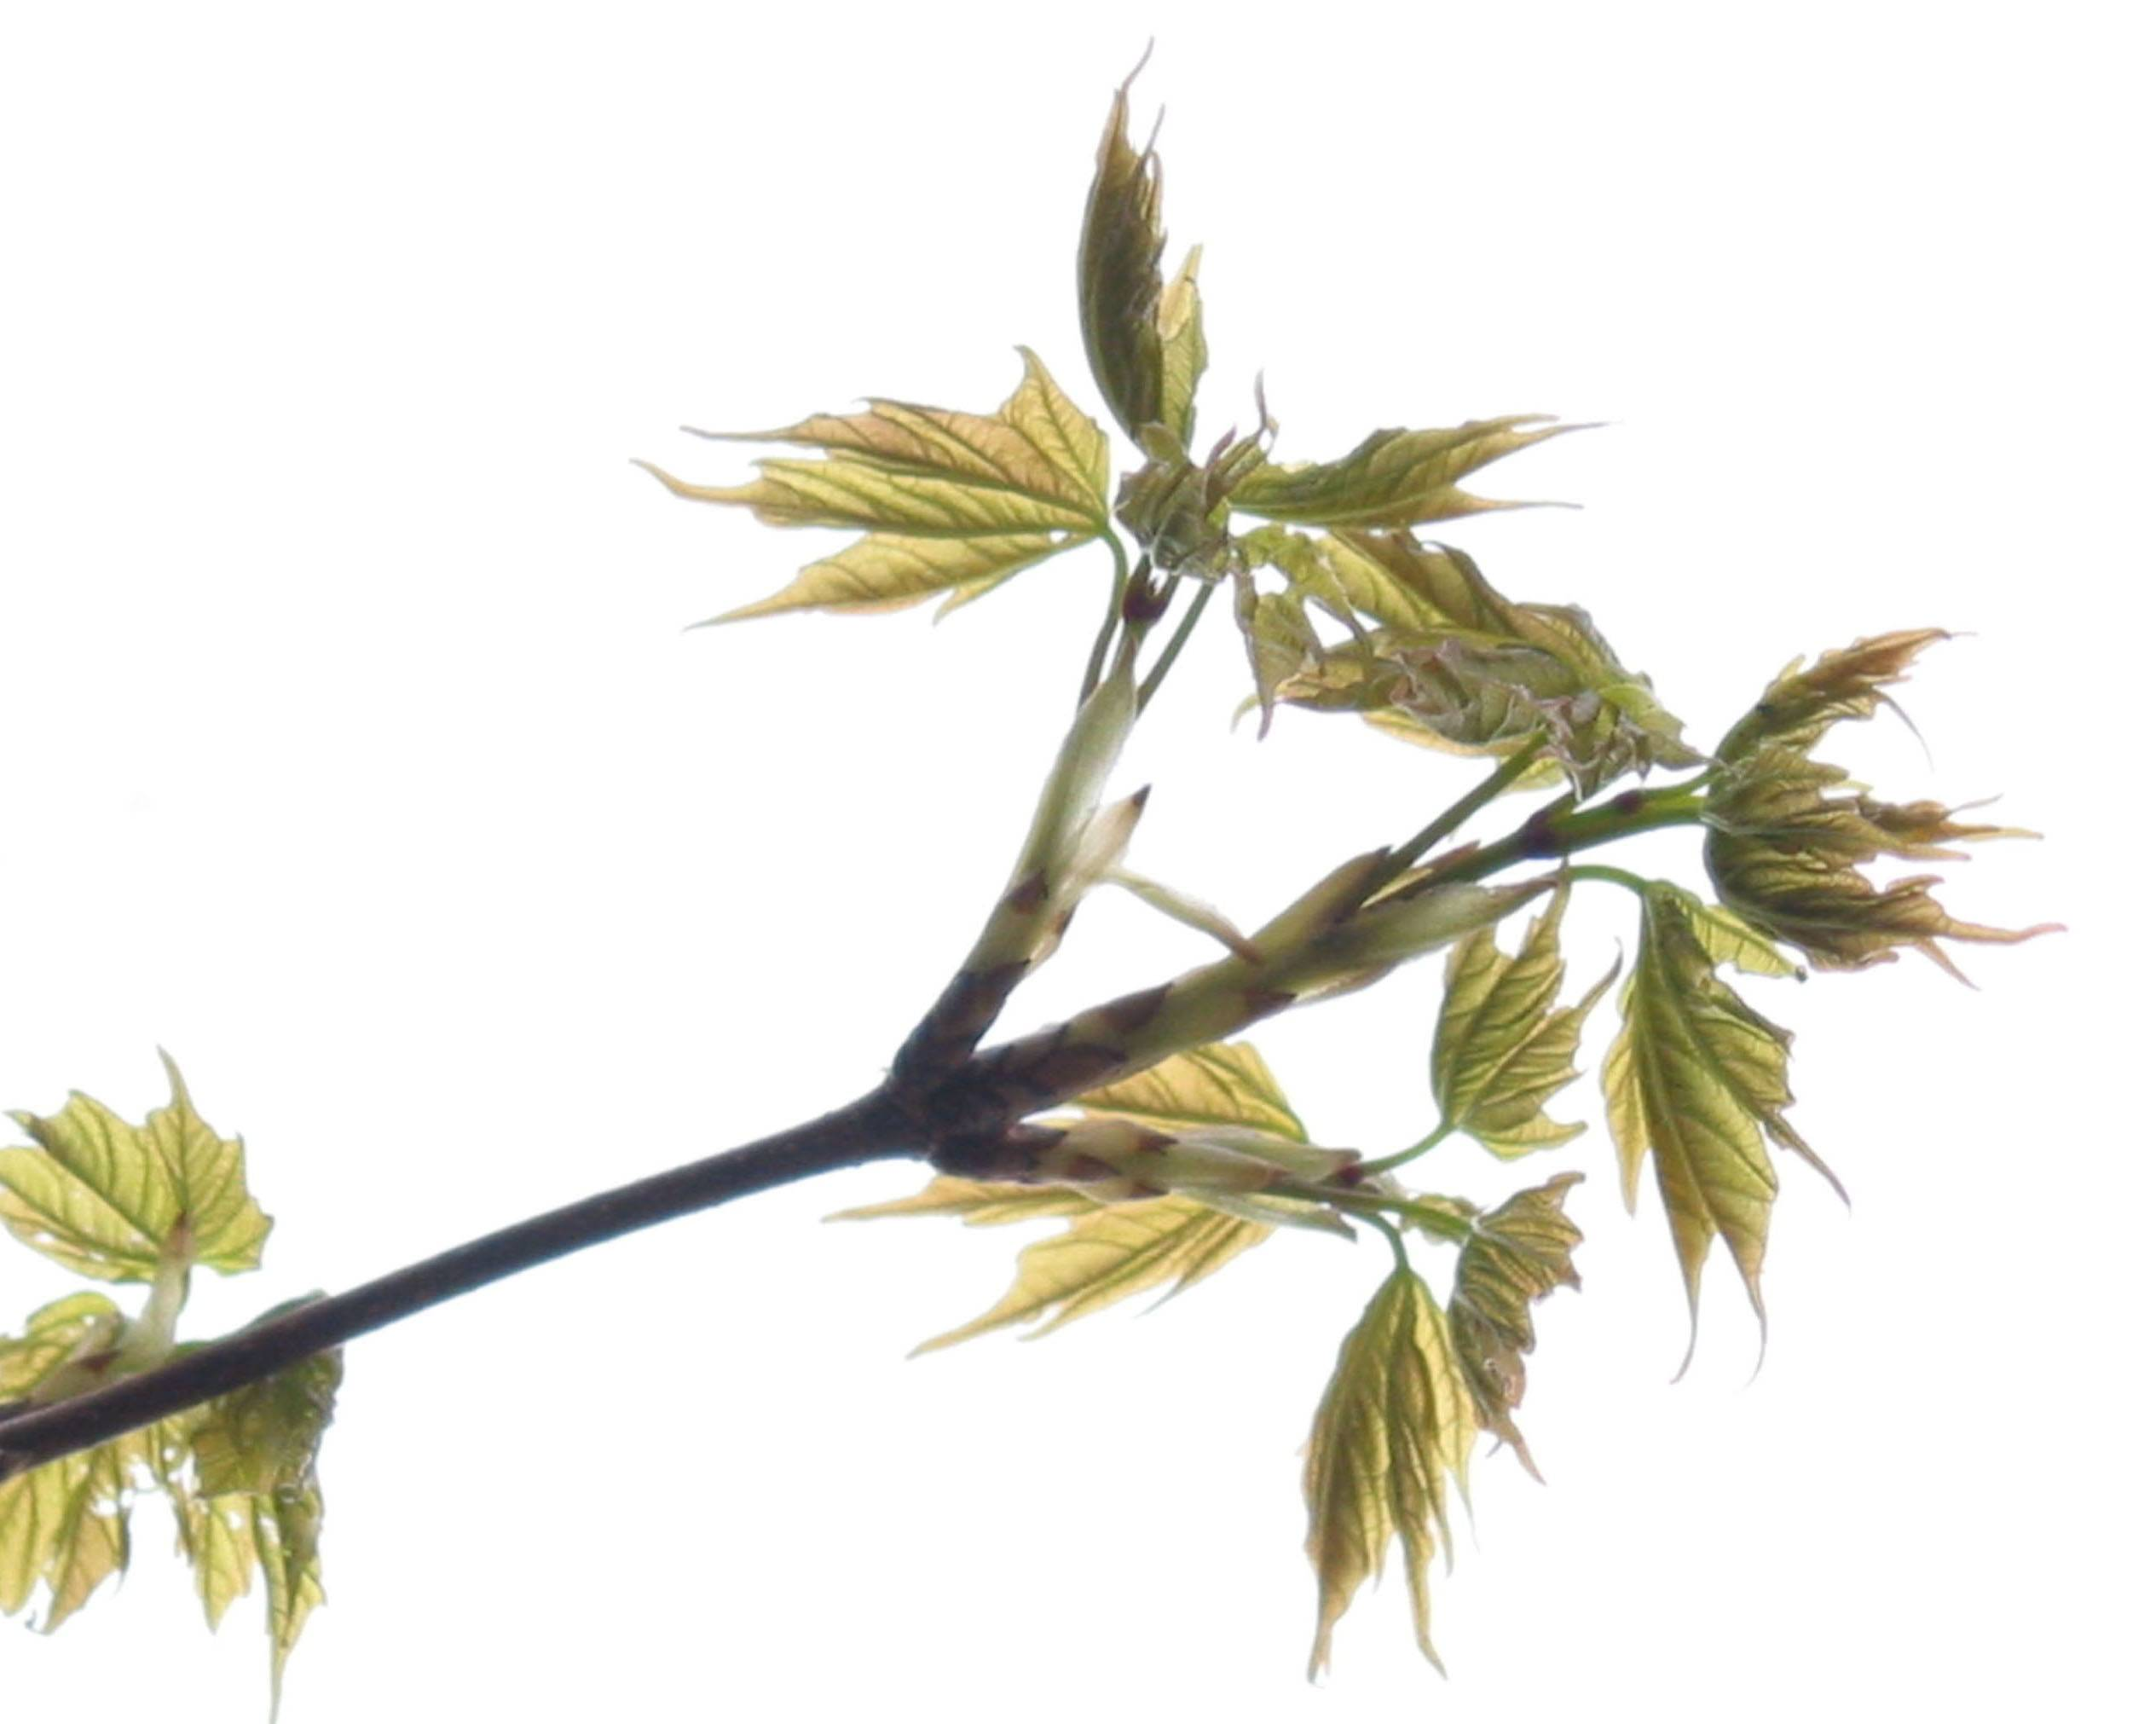 Baby sugar maple leaves